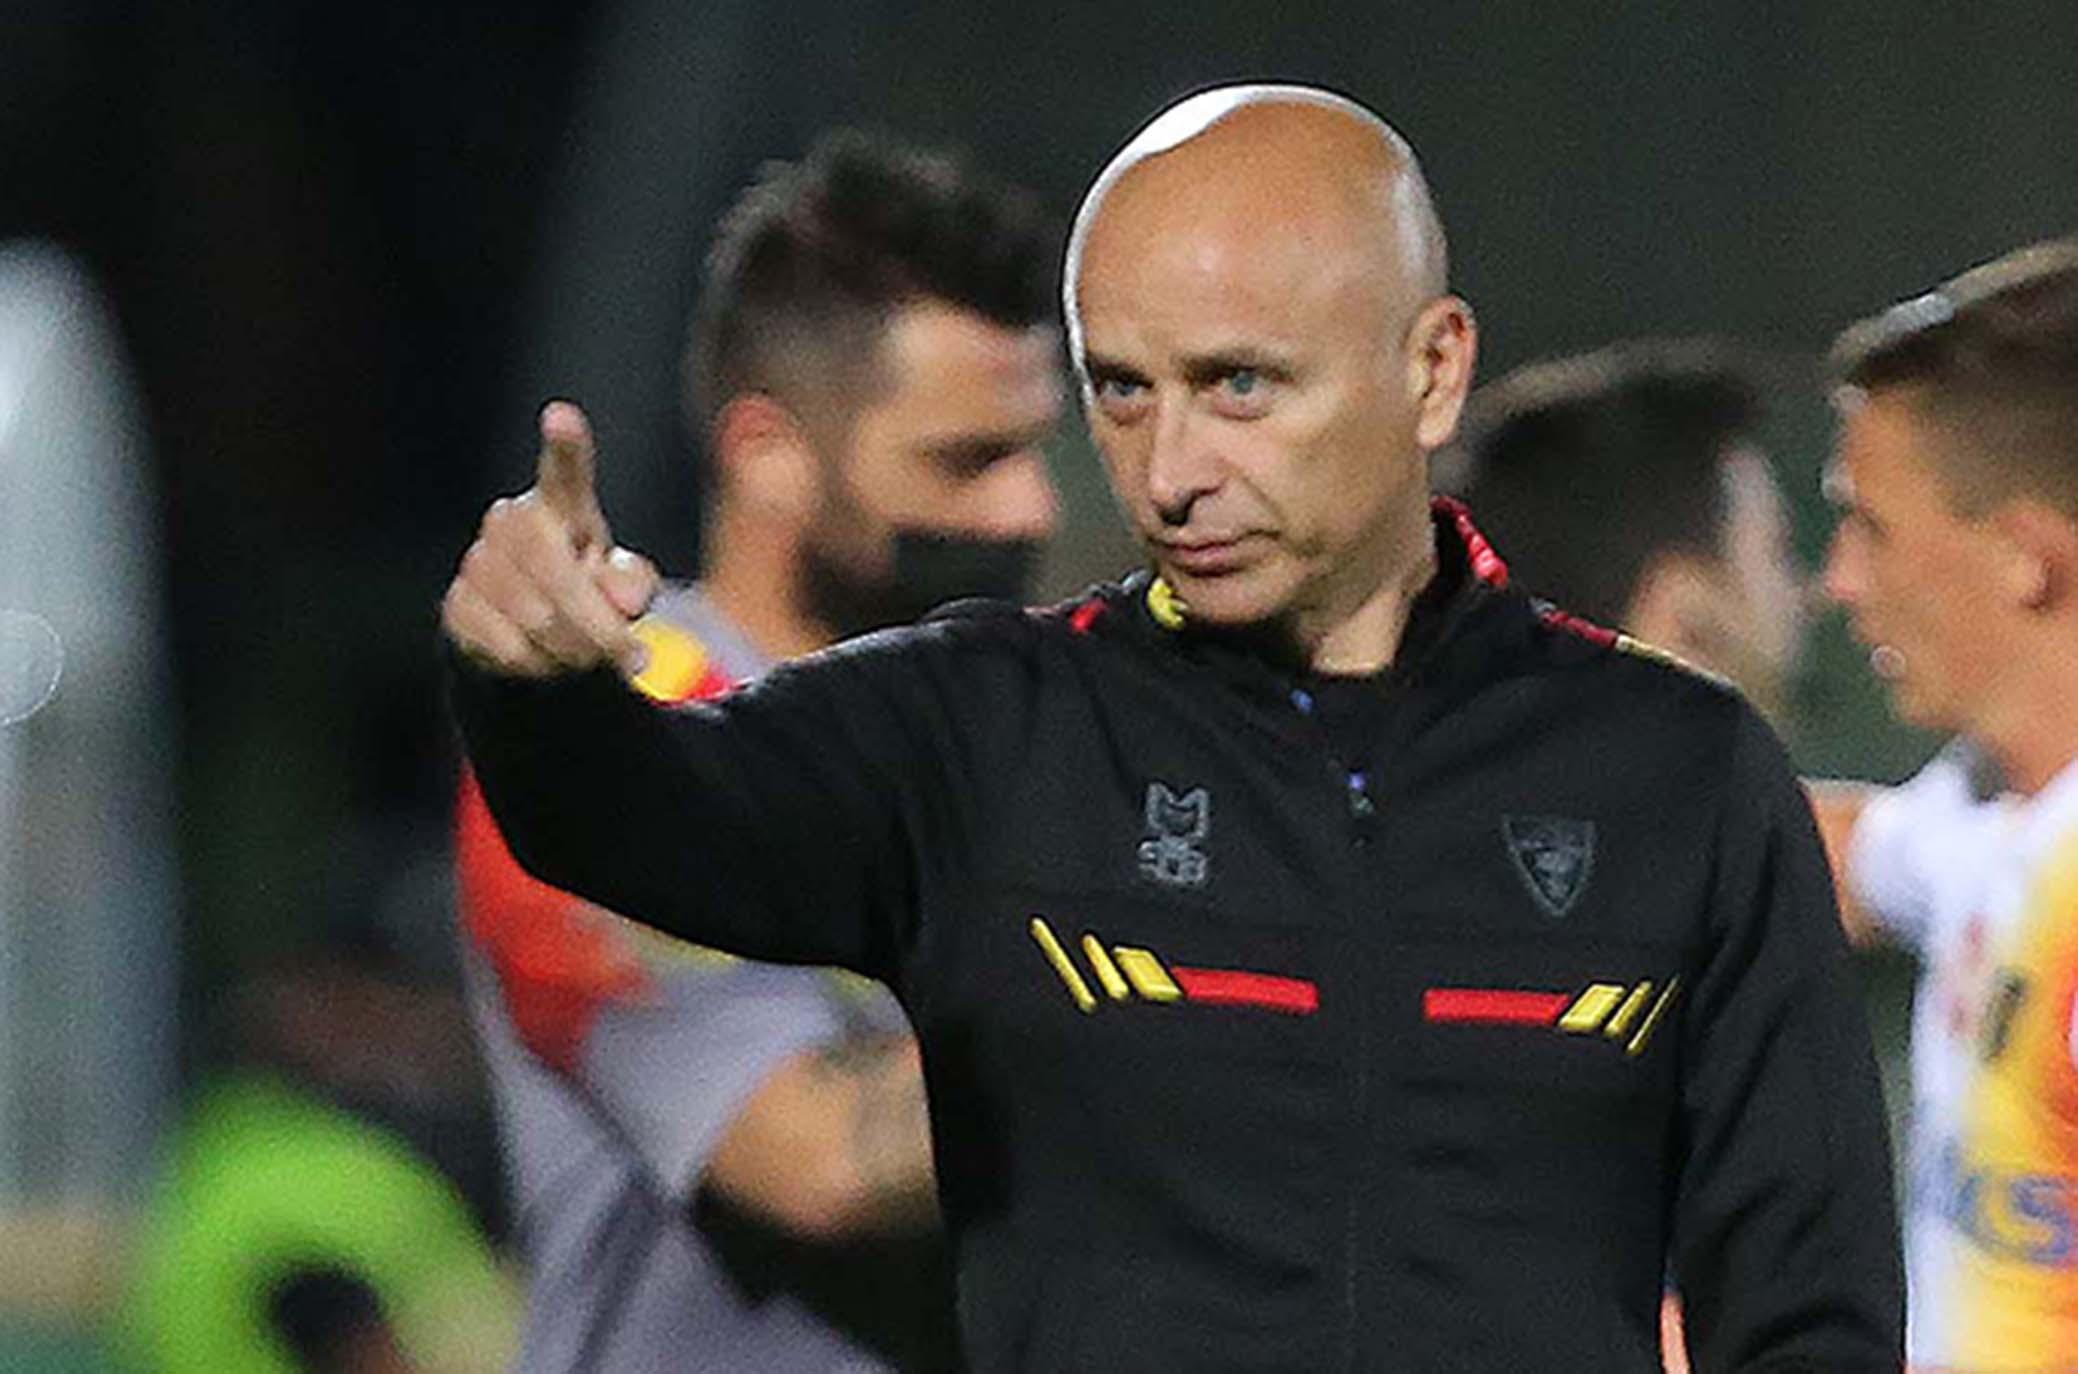 Corini to Serie A?  Above him is the Sampdoria